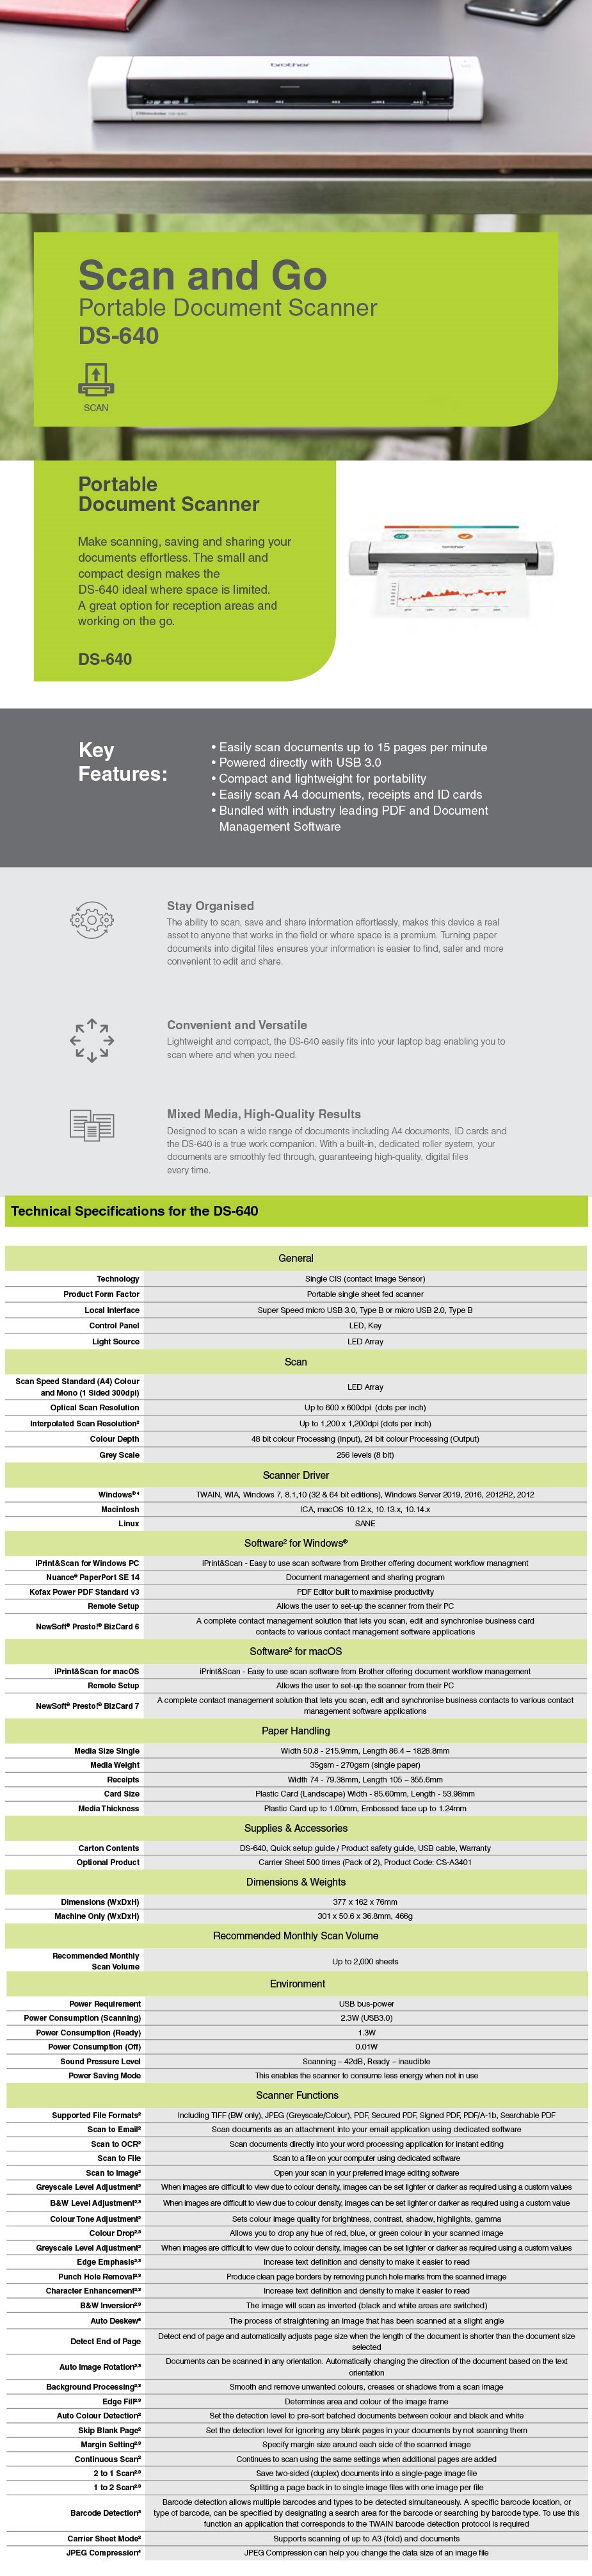 epson-ds640-portable-document-scanner-ac33374-3.jpg